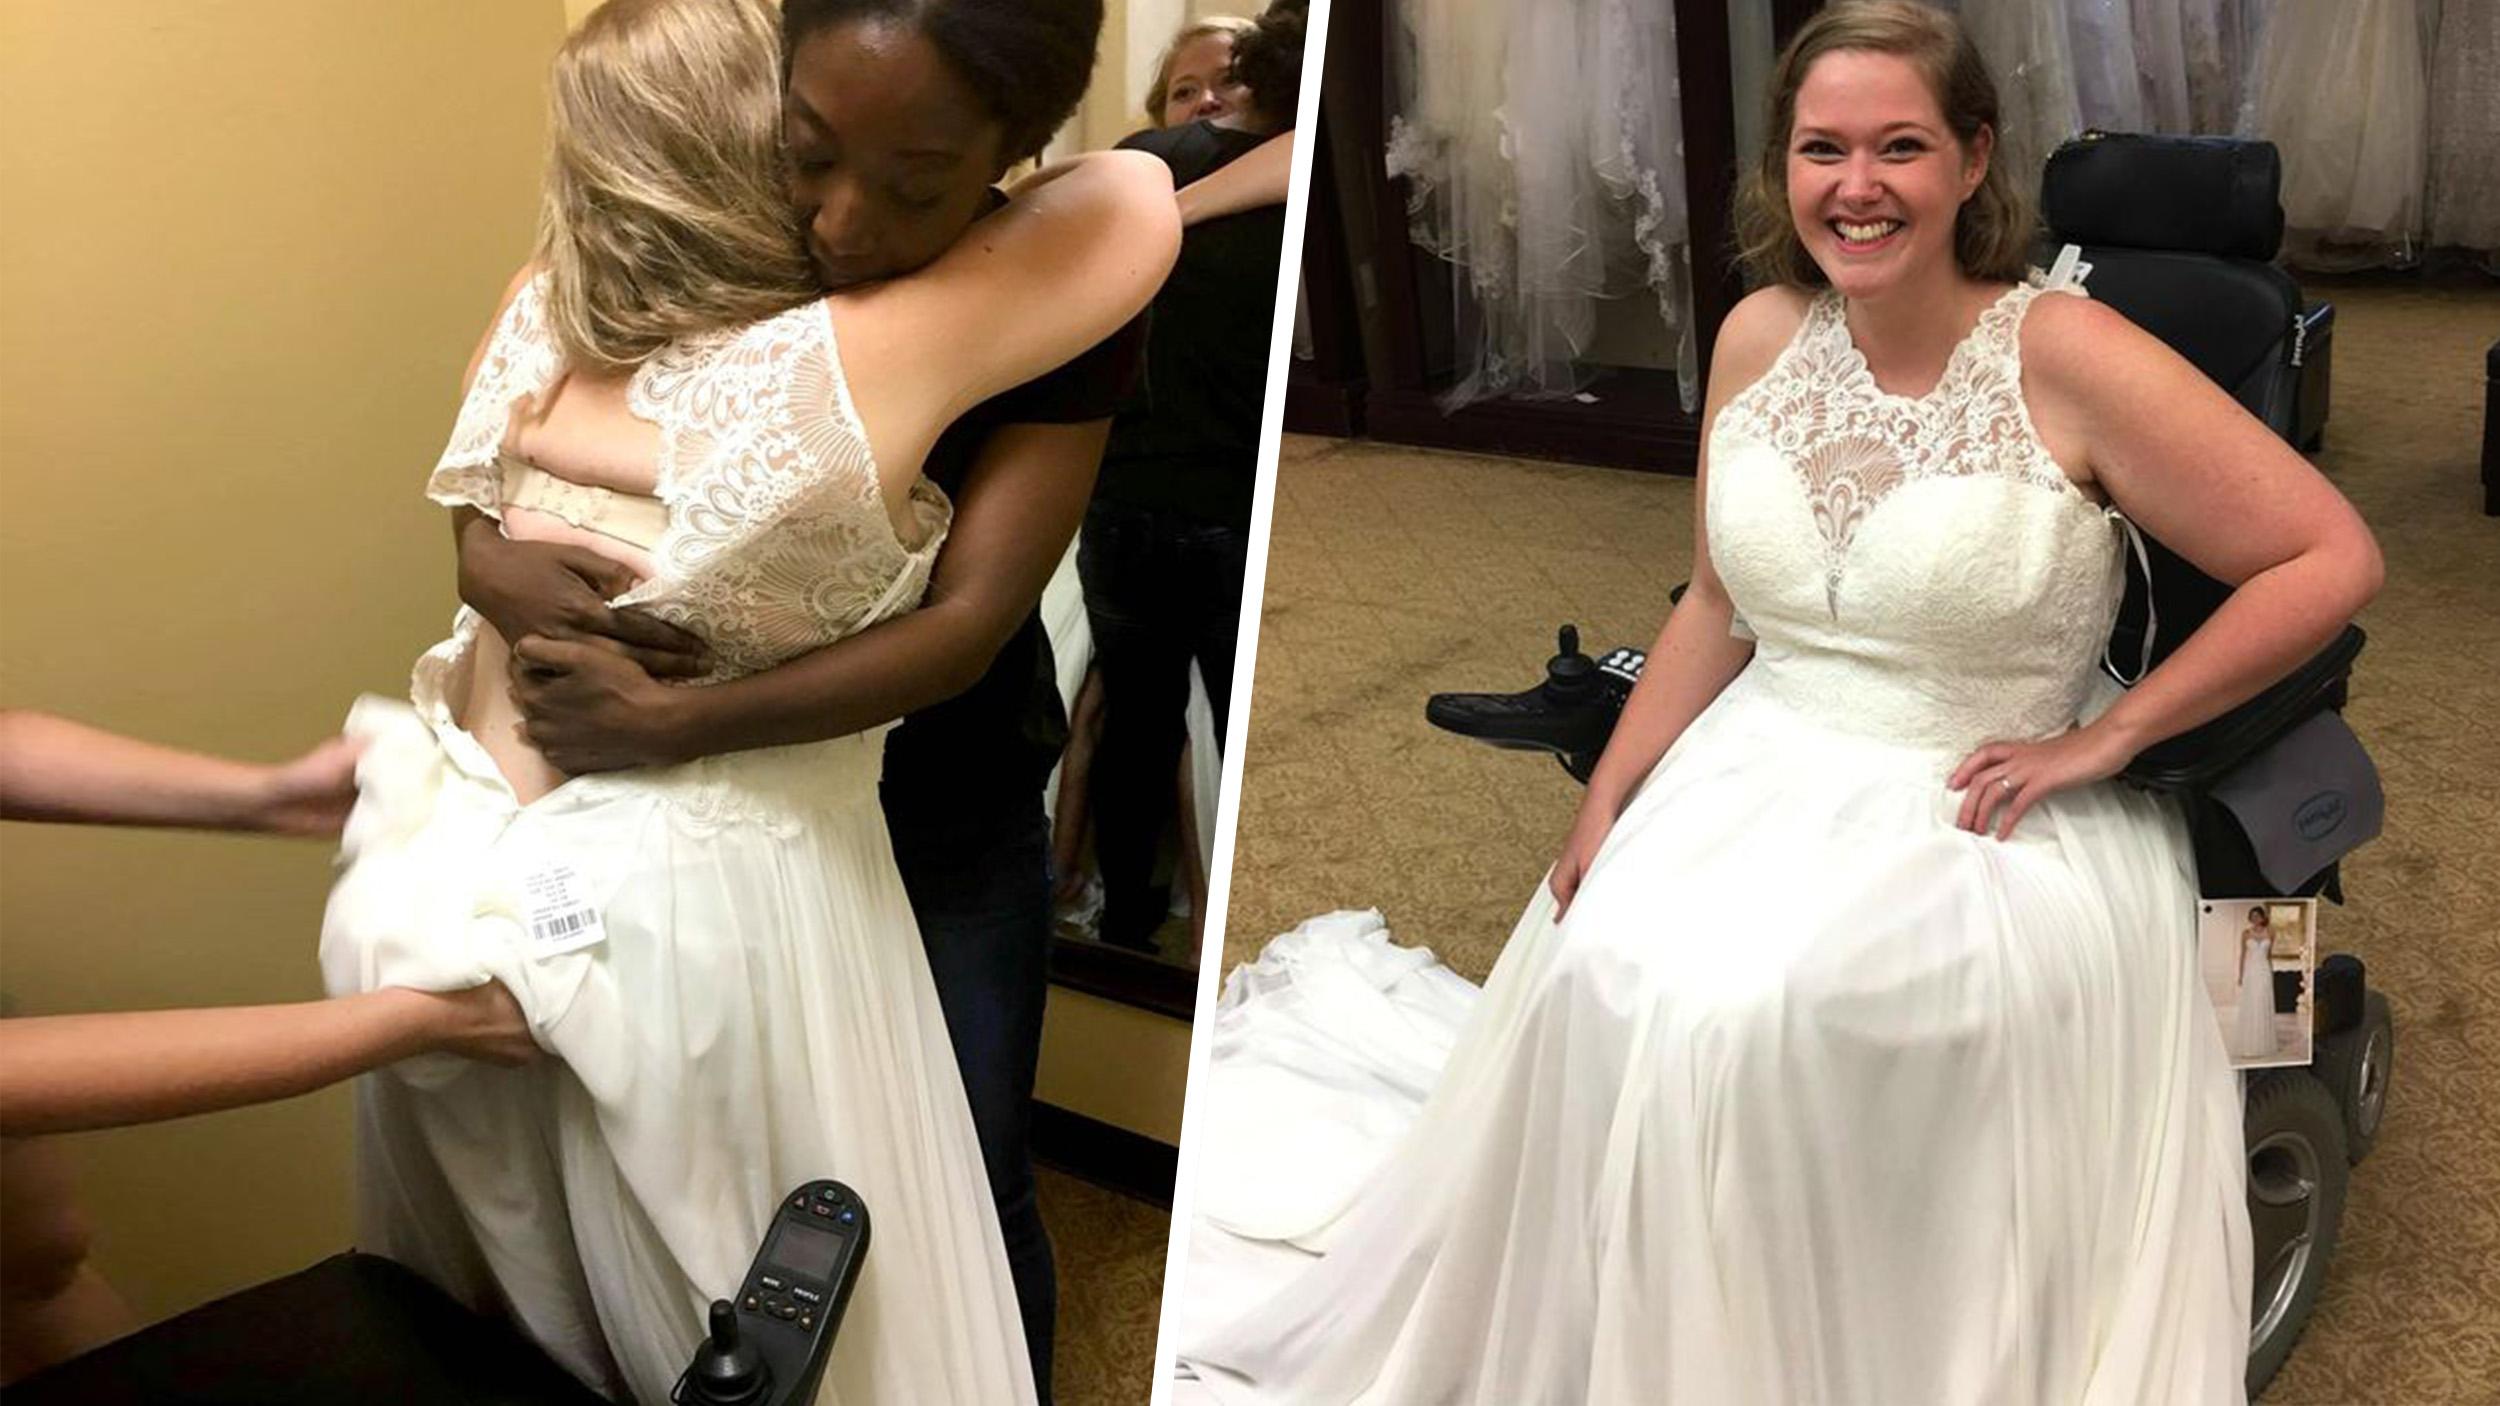 Shopping For A Wedding Dress In A Wheelchair